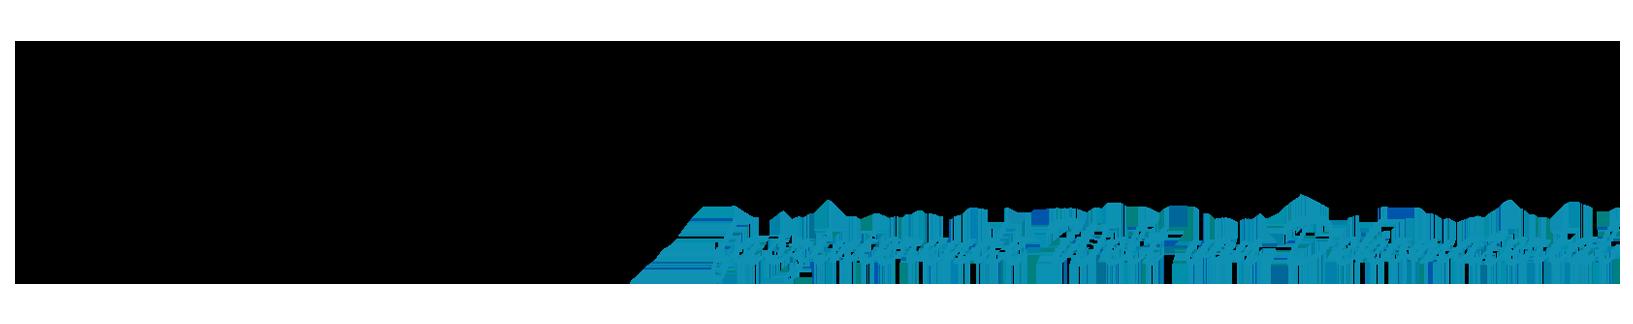 lifestyle-dekoration.de-Logo